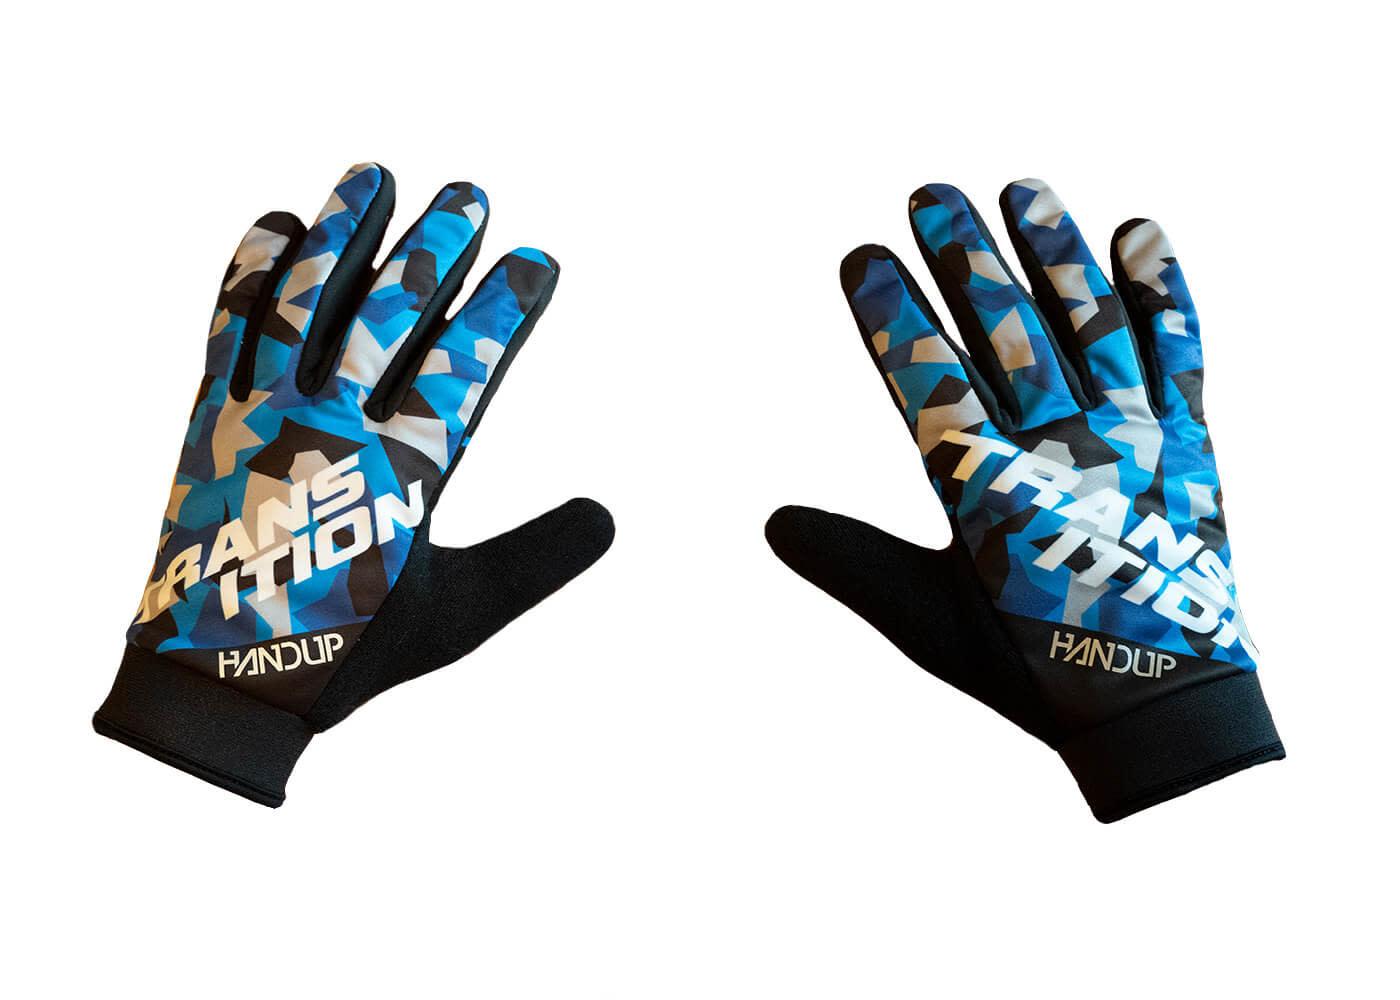 Transition TBC - Digital Frost Glove (X-Large, Blue/Grey/Black)